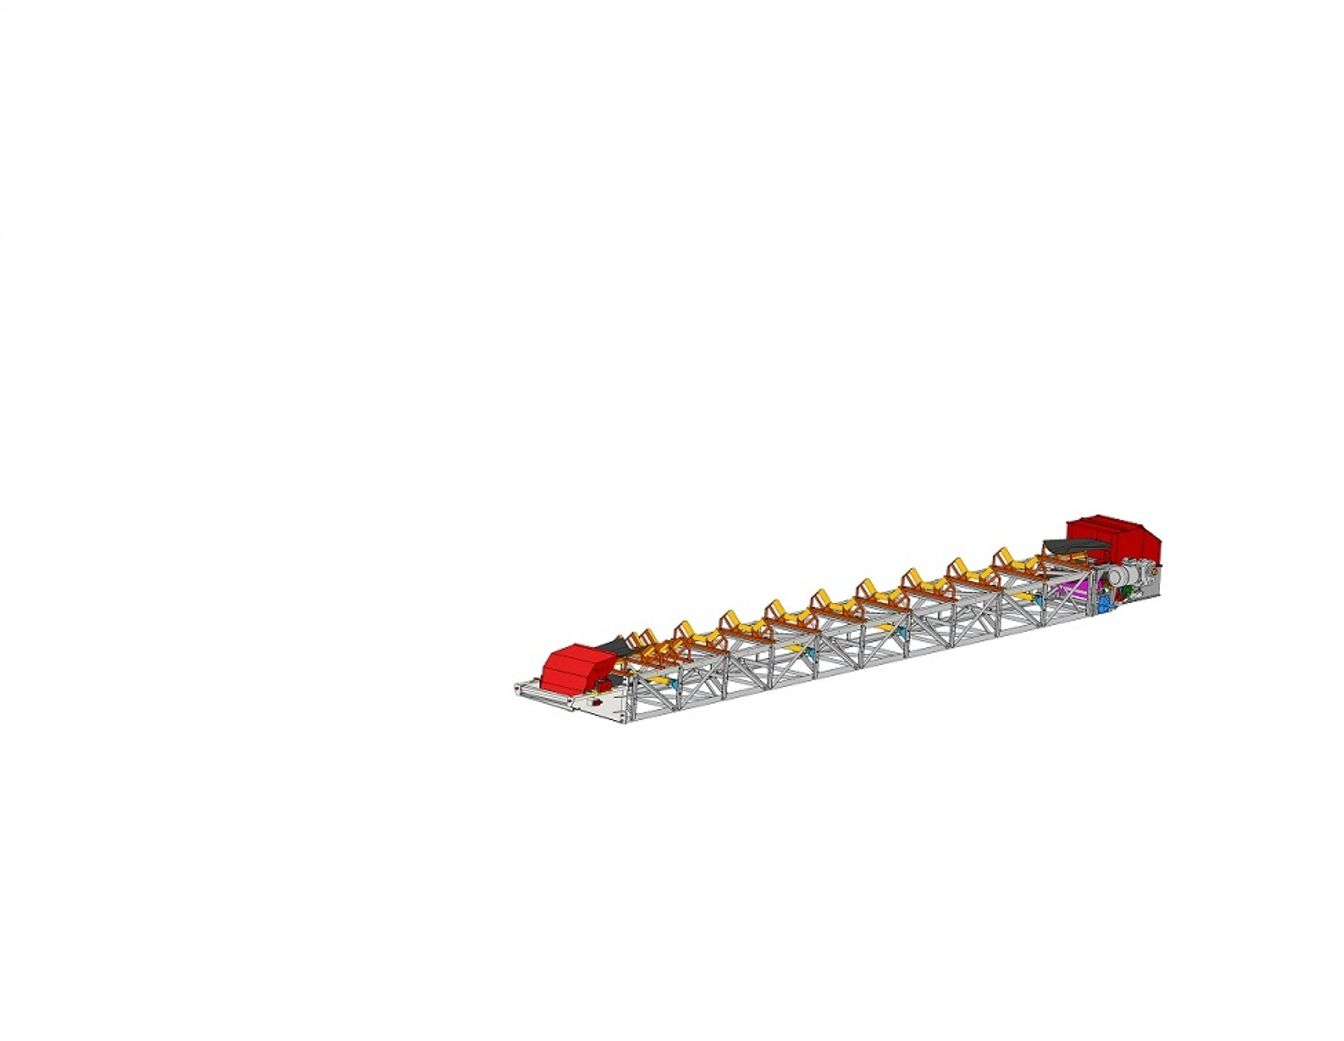 Belt conveyors by thyssenkrupp